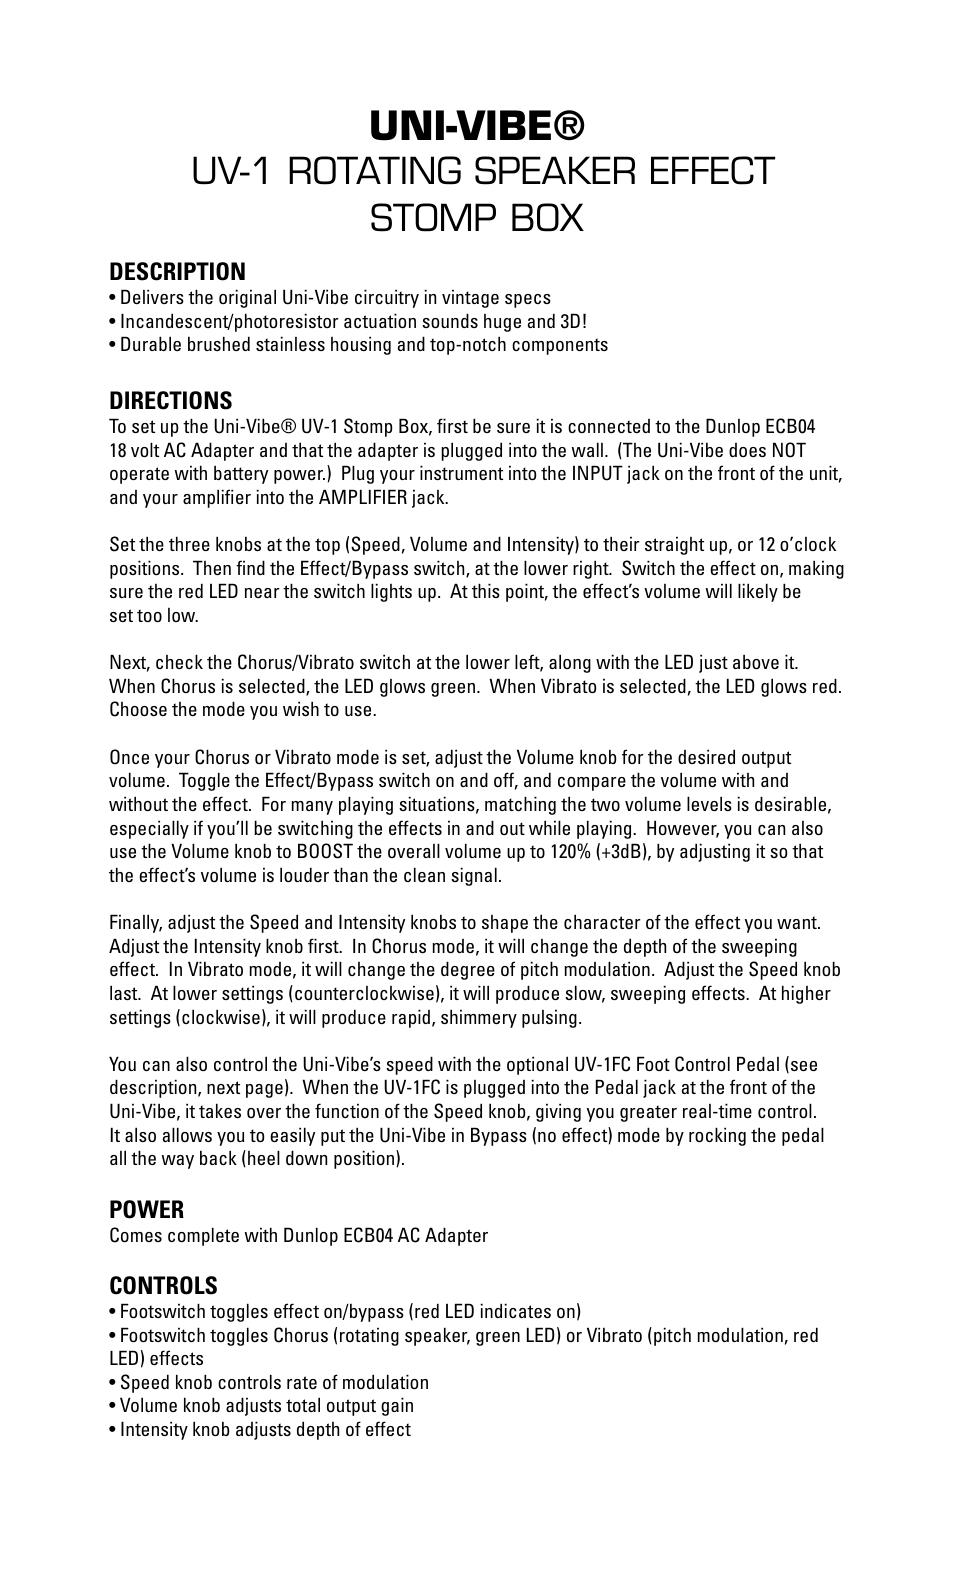 Dunlop Manufacturing UV-1 ROTATING SPEAKER EFFECT User Manual   1 page